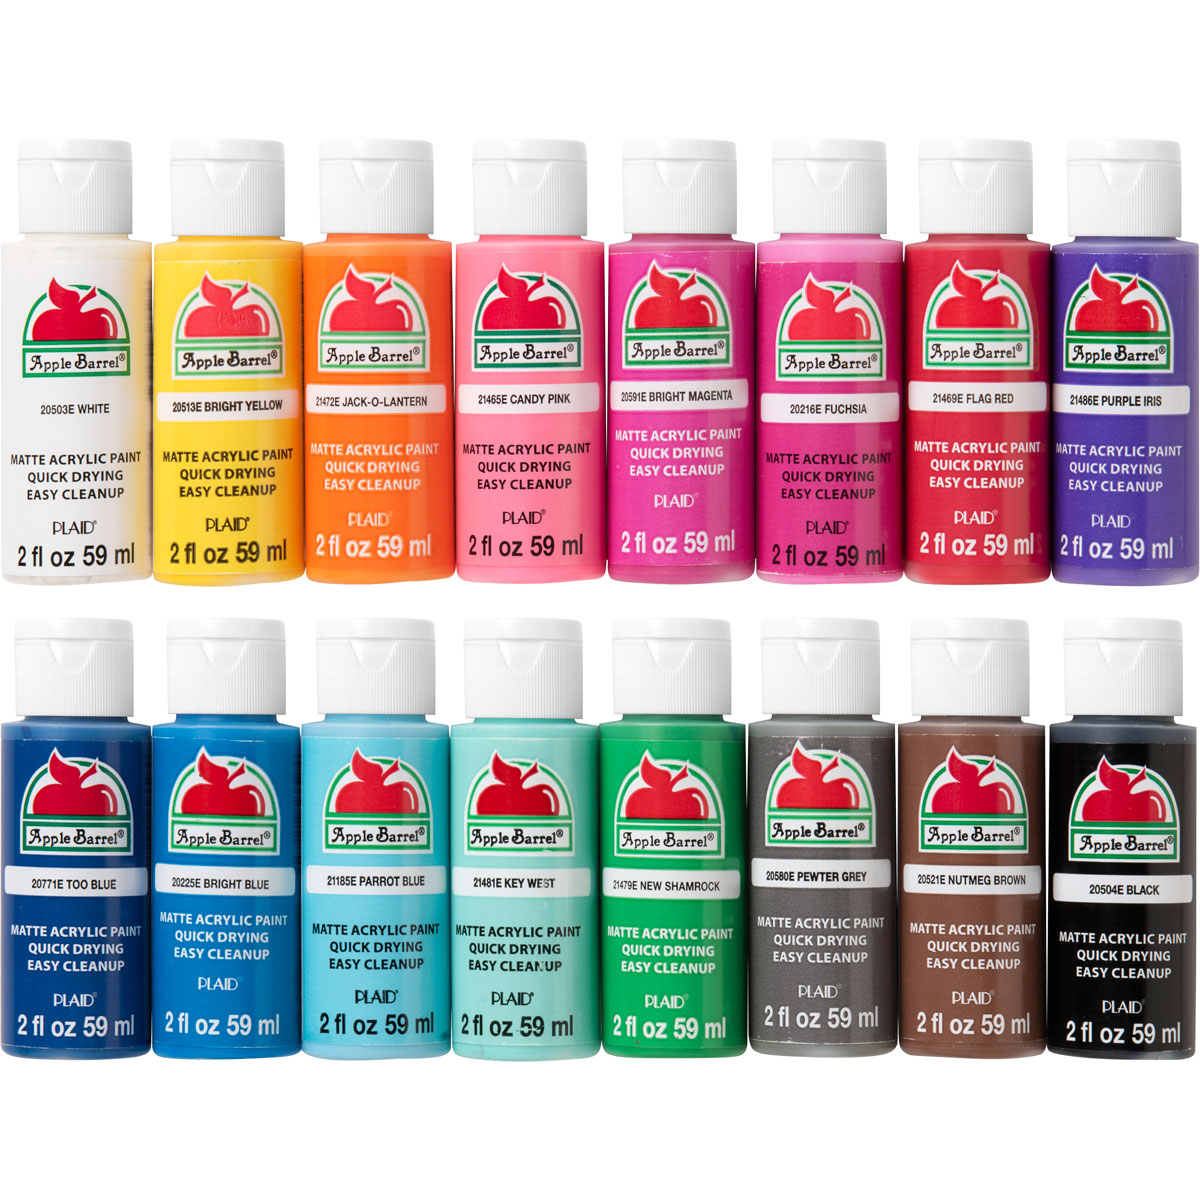 Apple Barrel ® Colors Acrylic Paint 16 Color Set - PROMOABIII